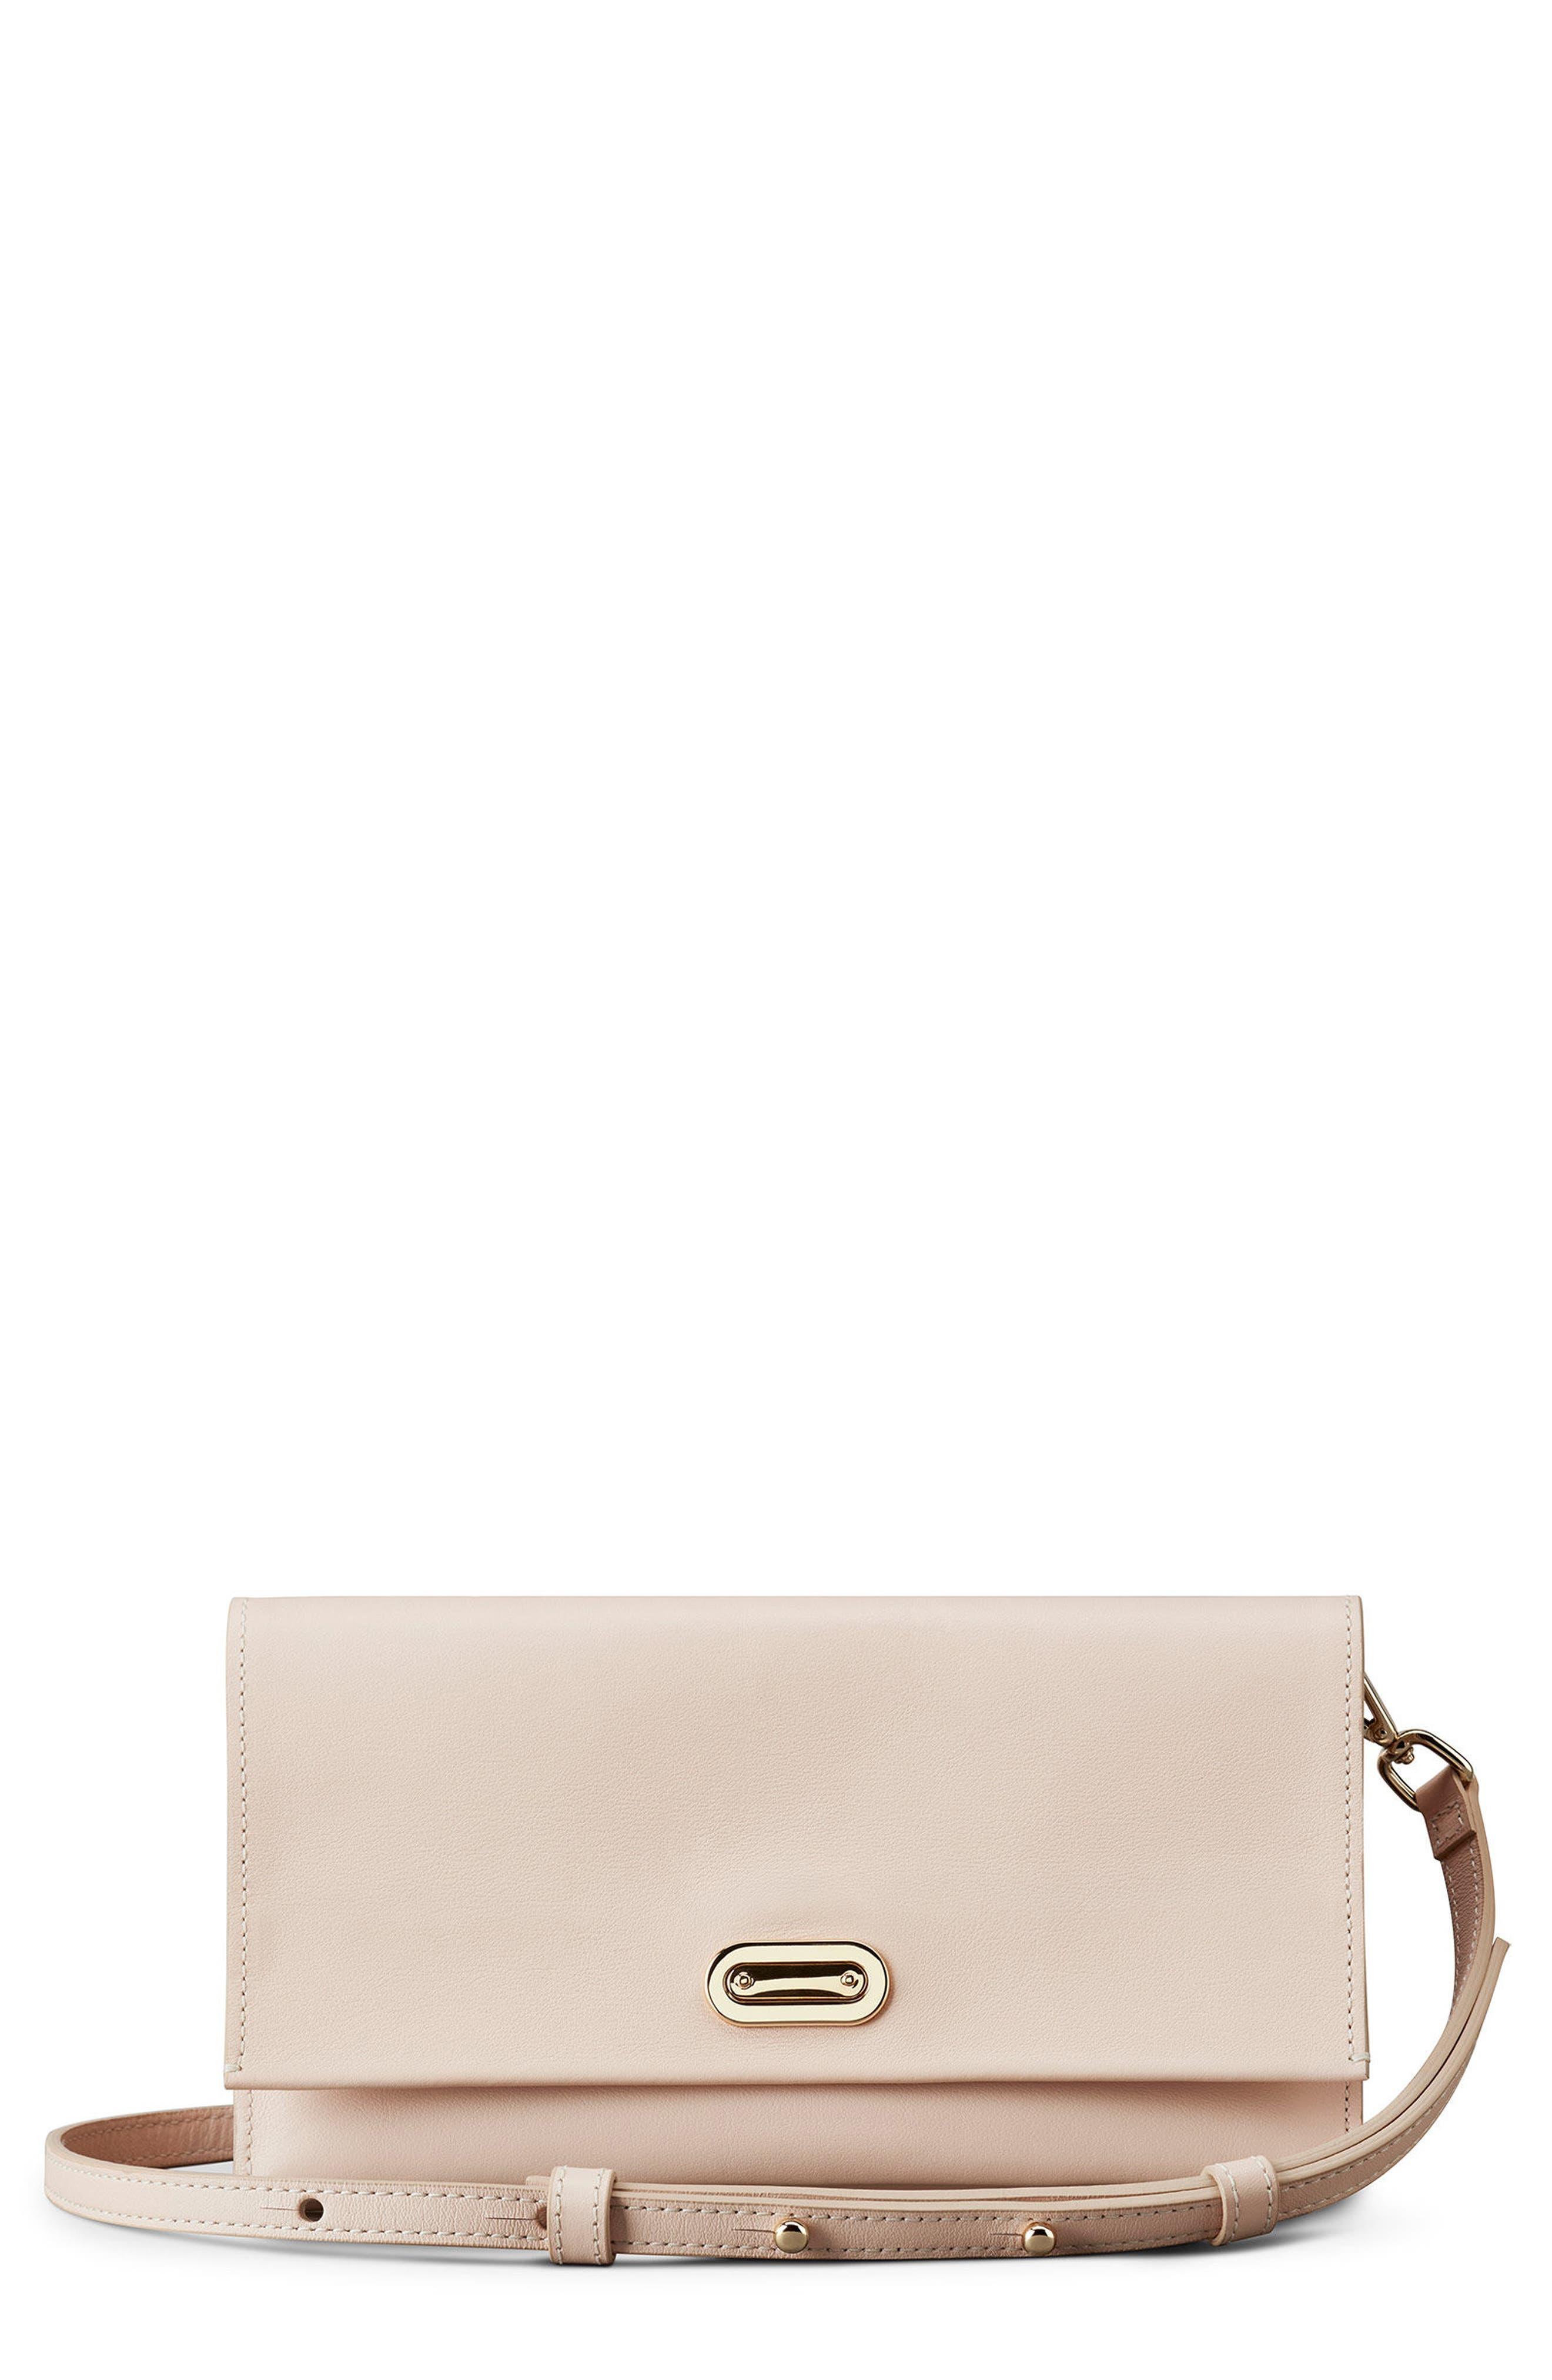 Shinola Birdy Leather Crossbody Bag